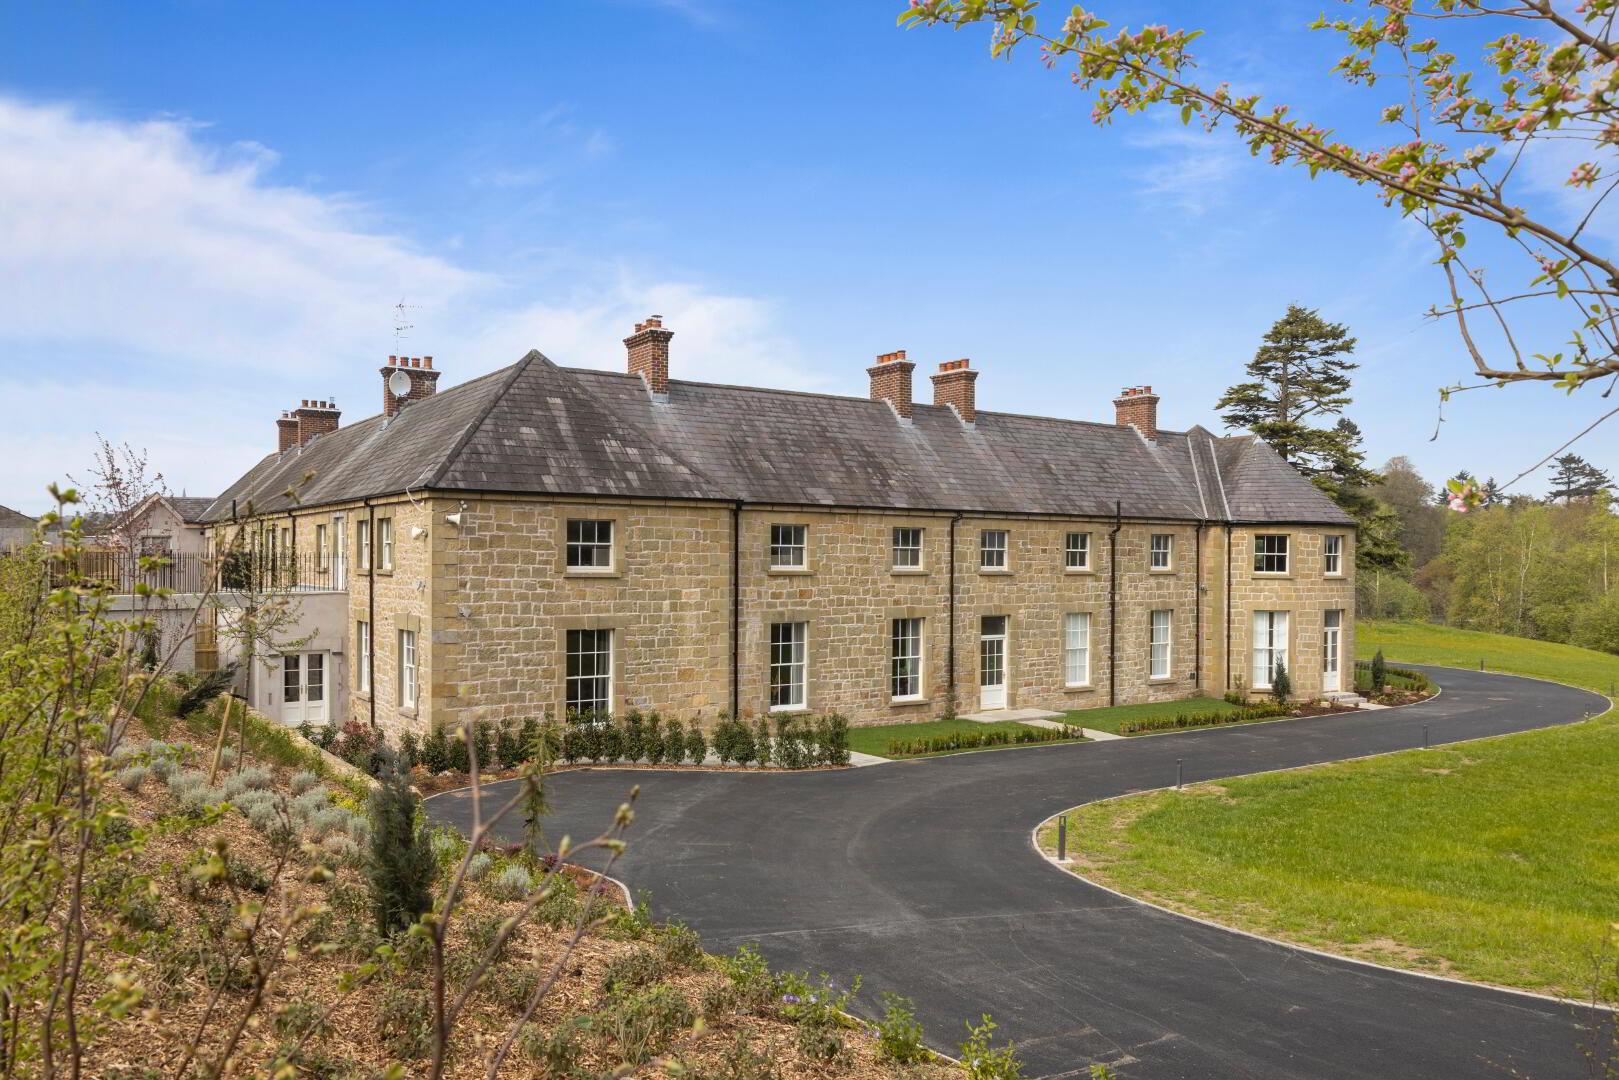 Photo 1 of Farm House, Ballynorthland Manor, Ballynorthland Demesne, Dungannon